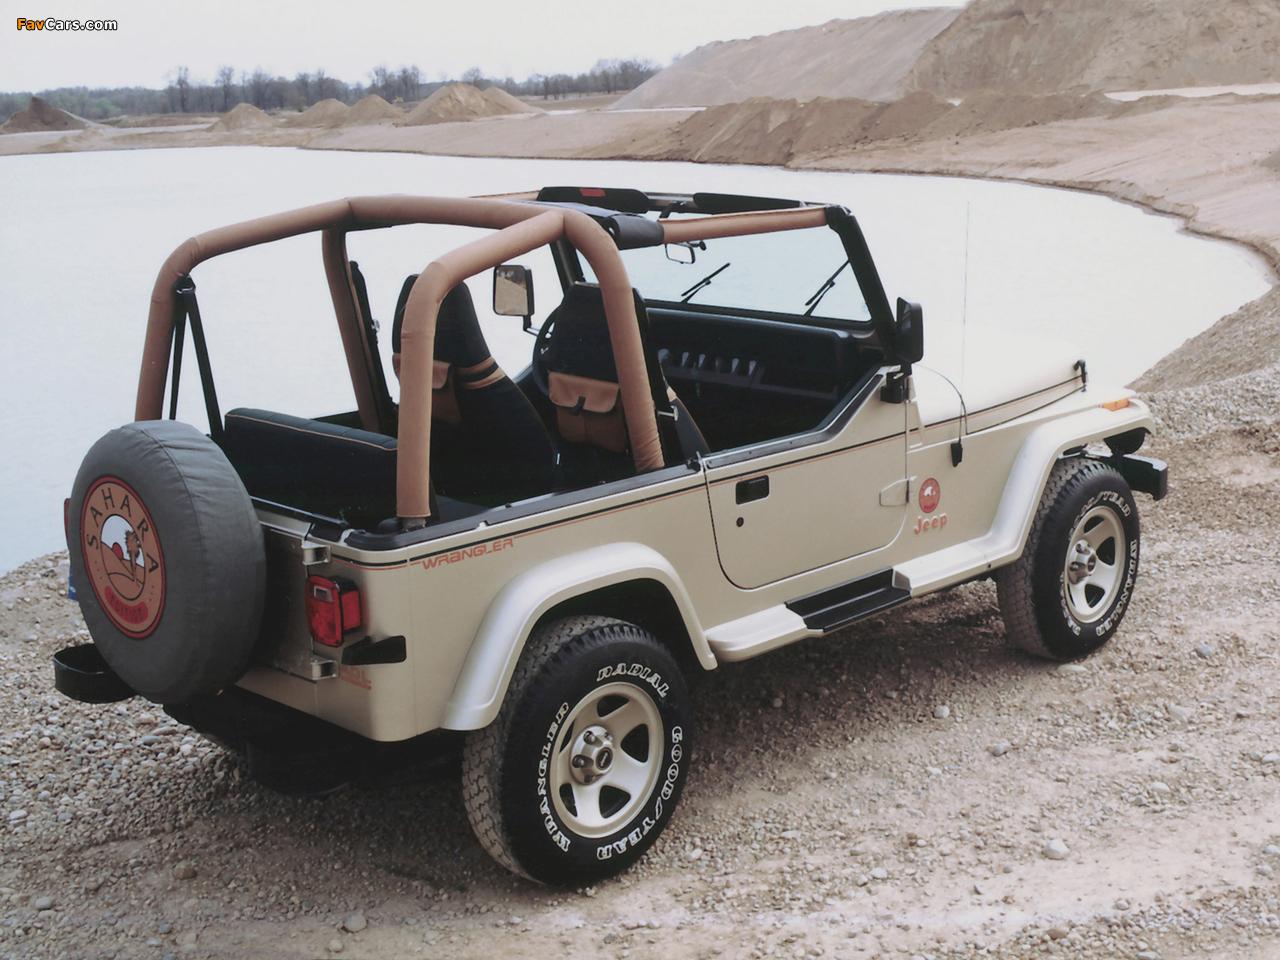 Jeep Wrangler Sahara (YJ) 1992 photos (1280 x 960)